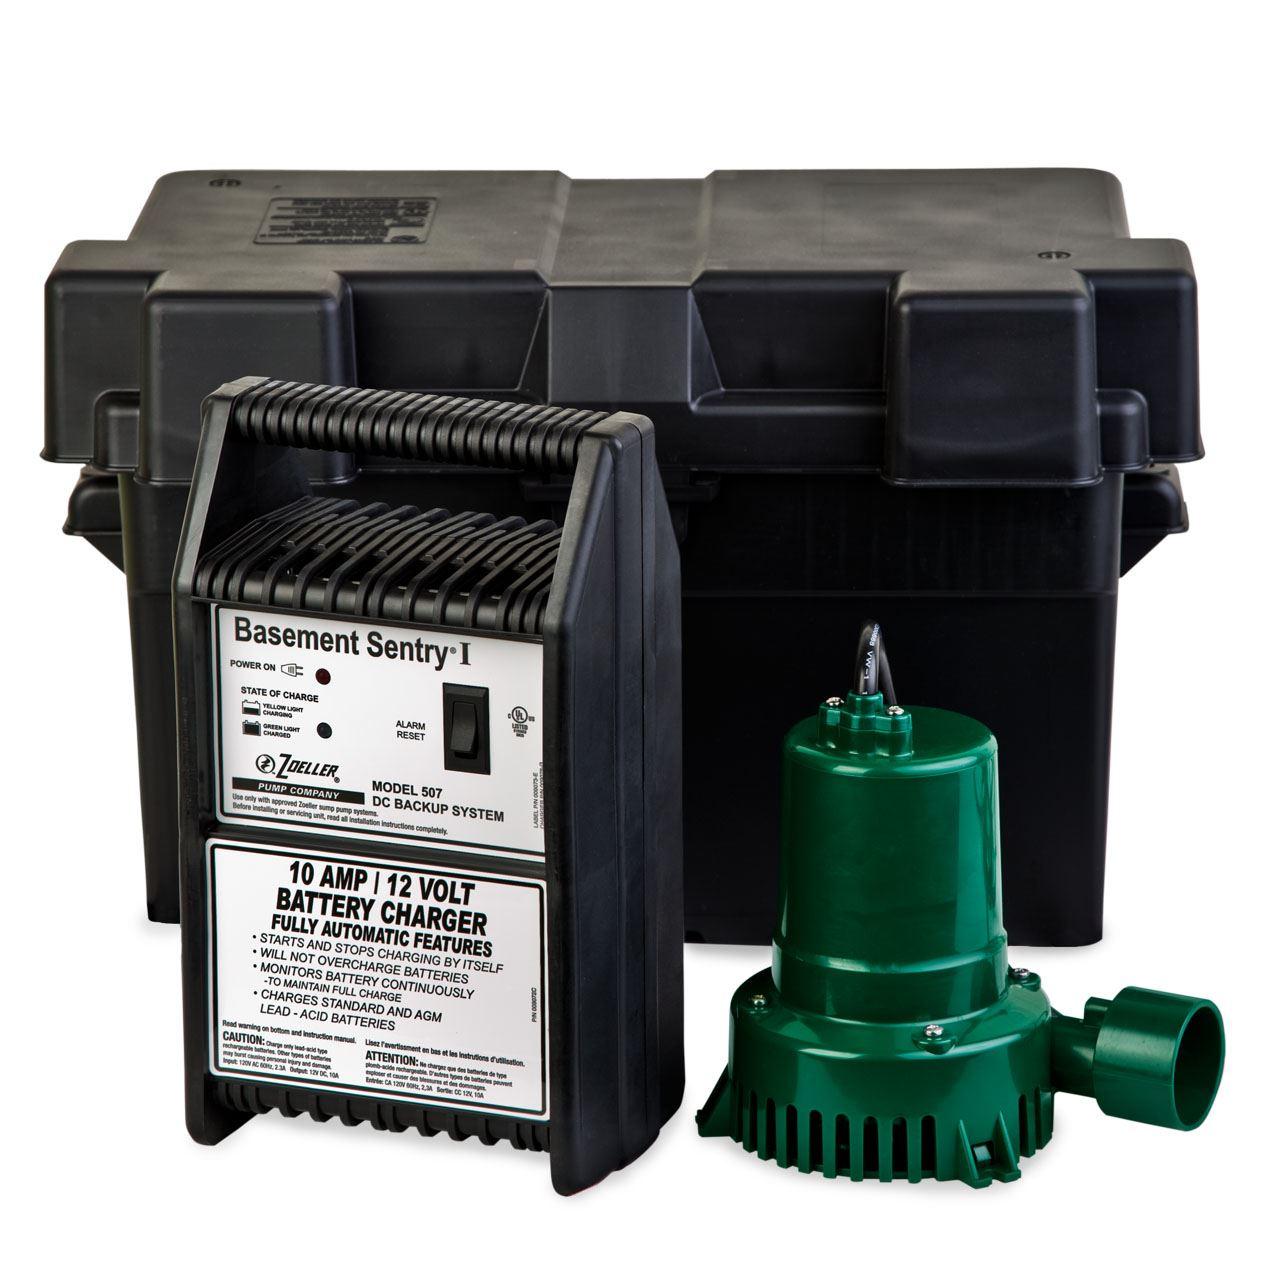 Wiring Diagram For Sump Pump Battery Backup Free Download 110 Volt Water Zoeller Pumps Basement Sentry 507